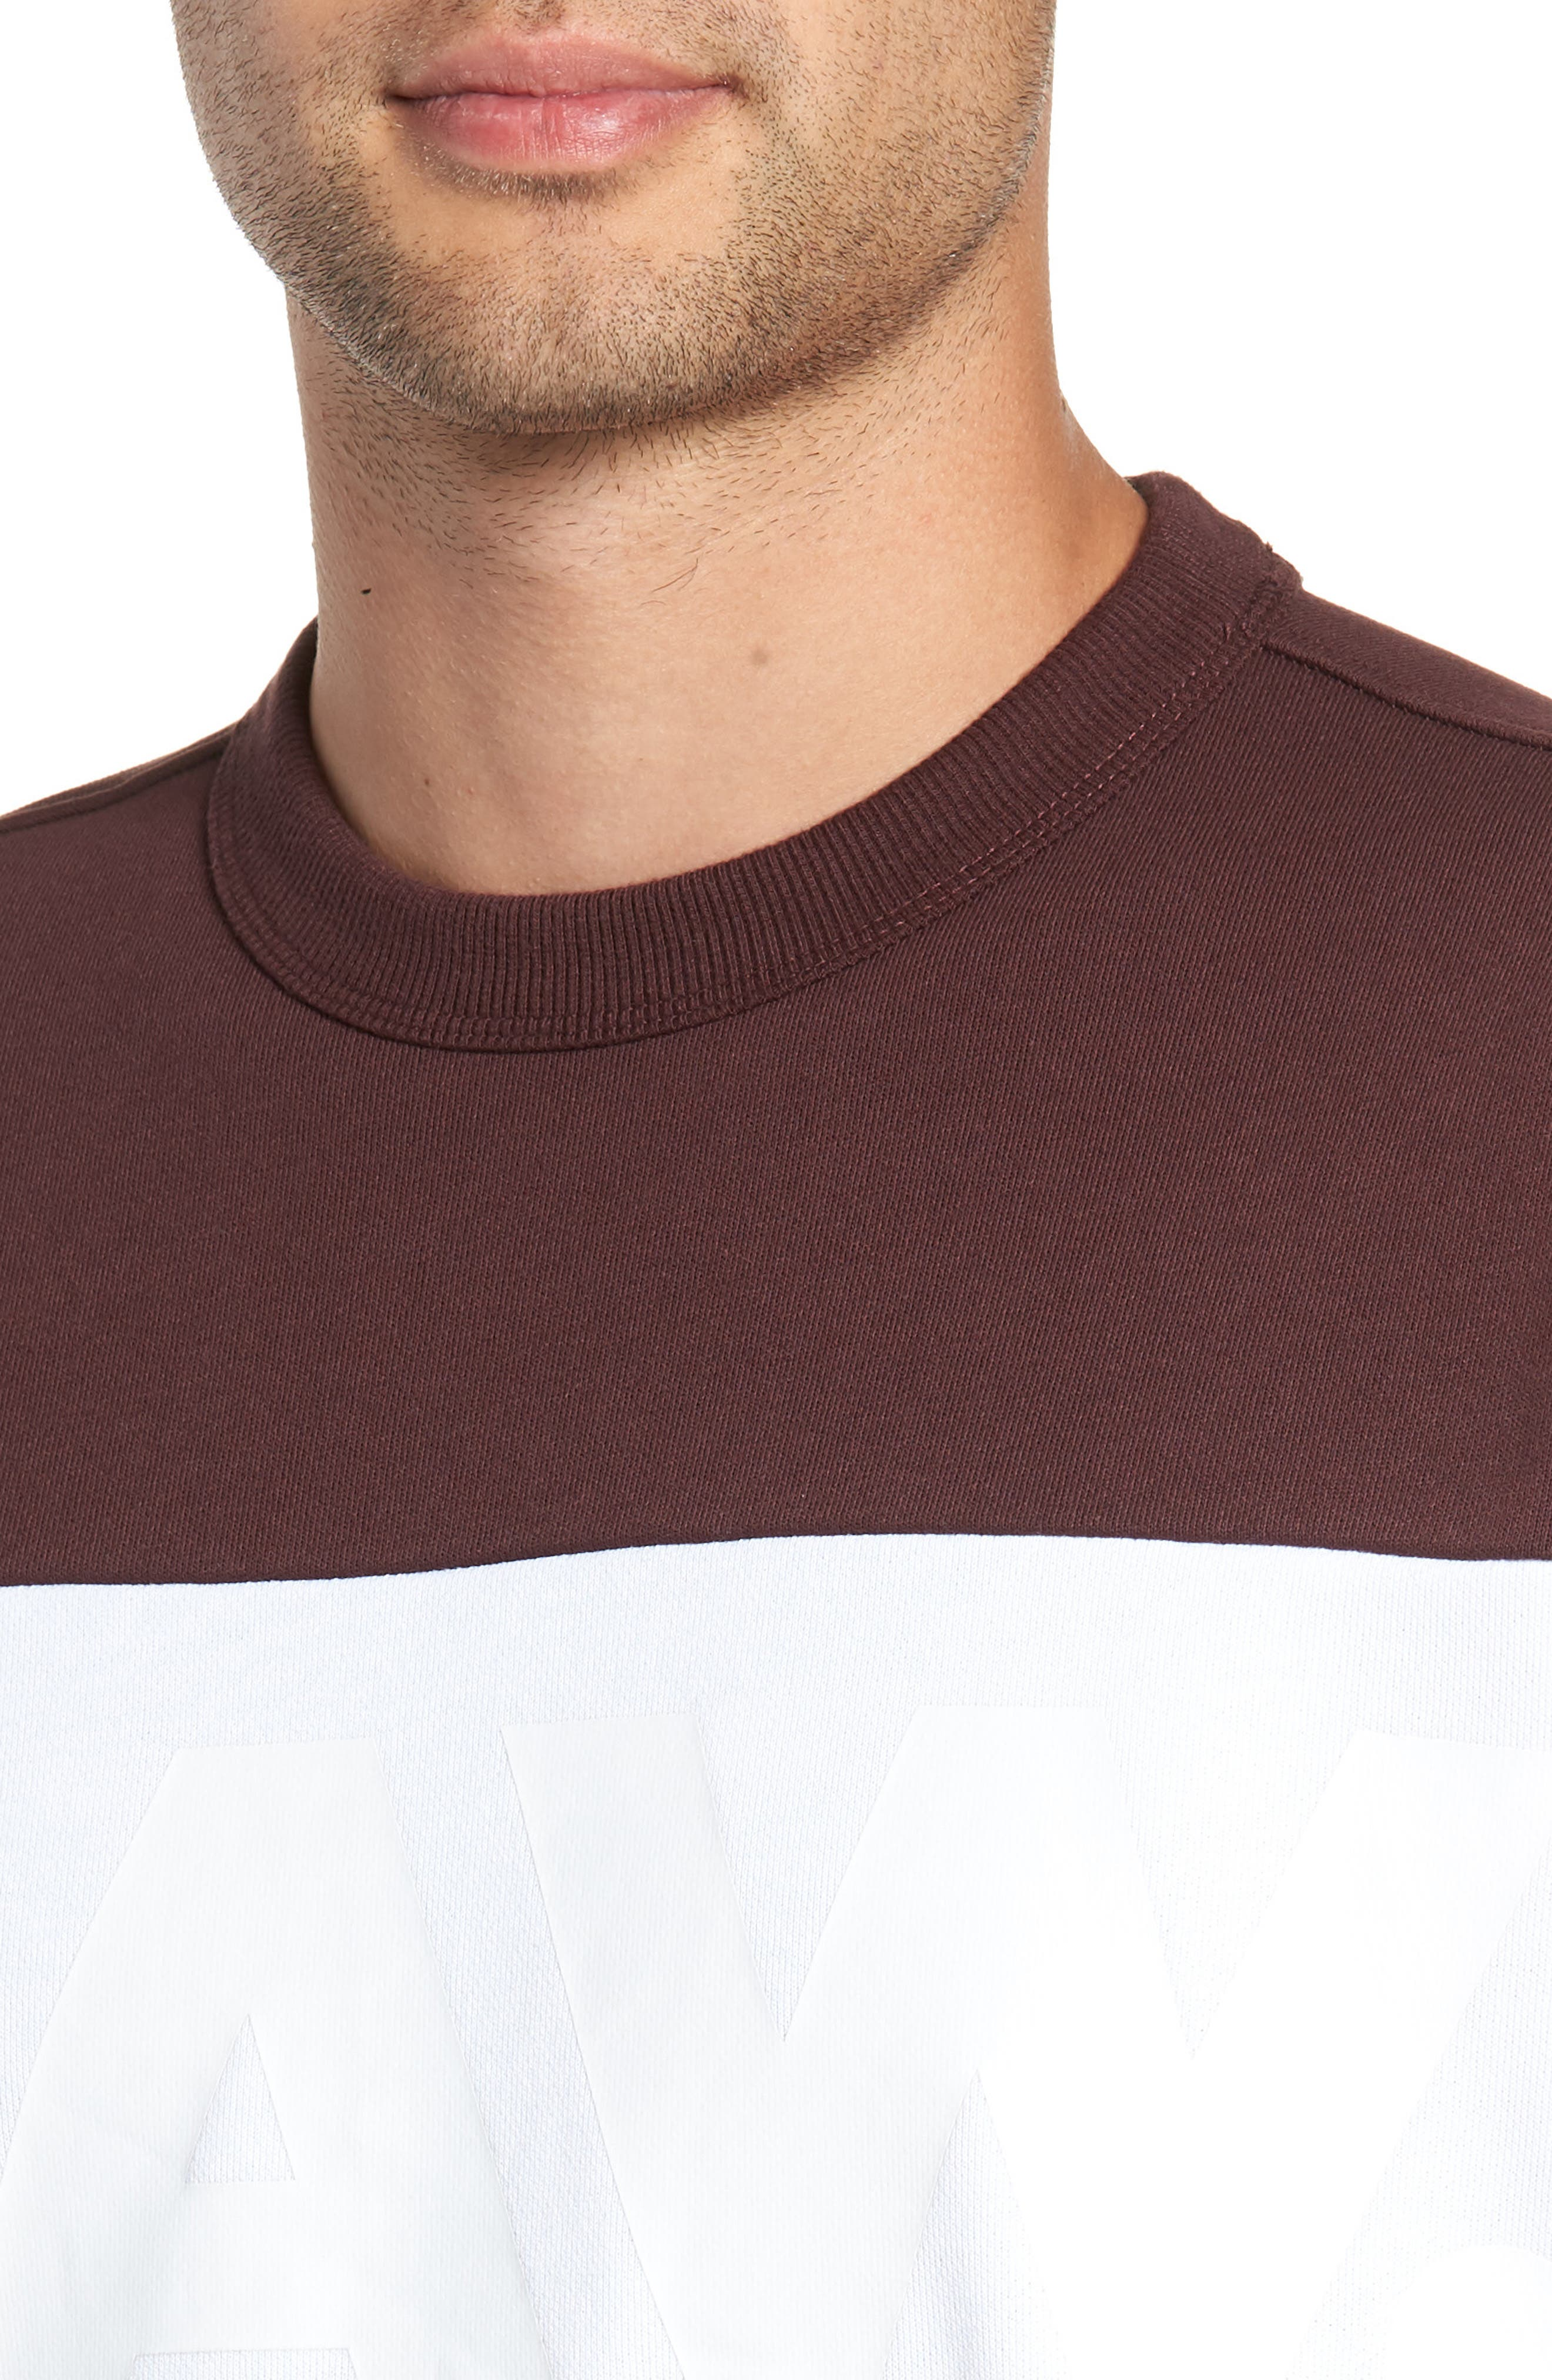 Libe Core Colorblock Sweatshirt,                             Alternate thumbnail 4, color,                             001